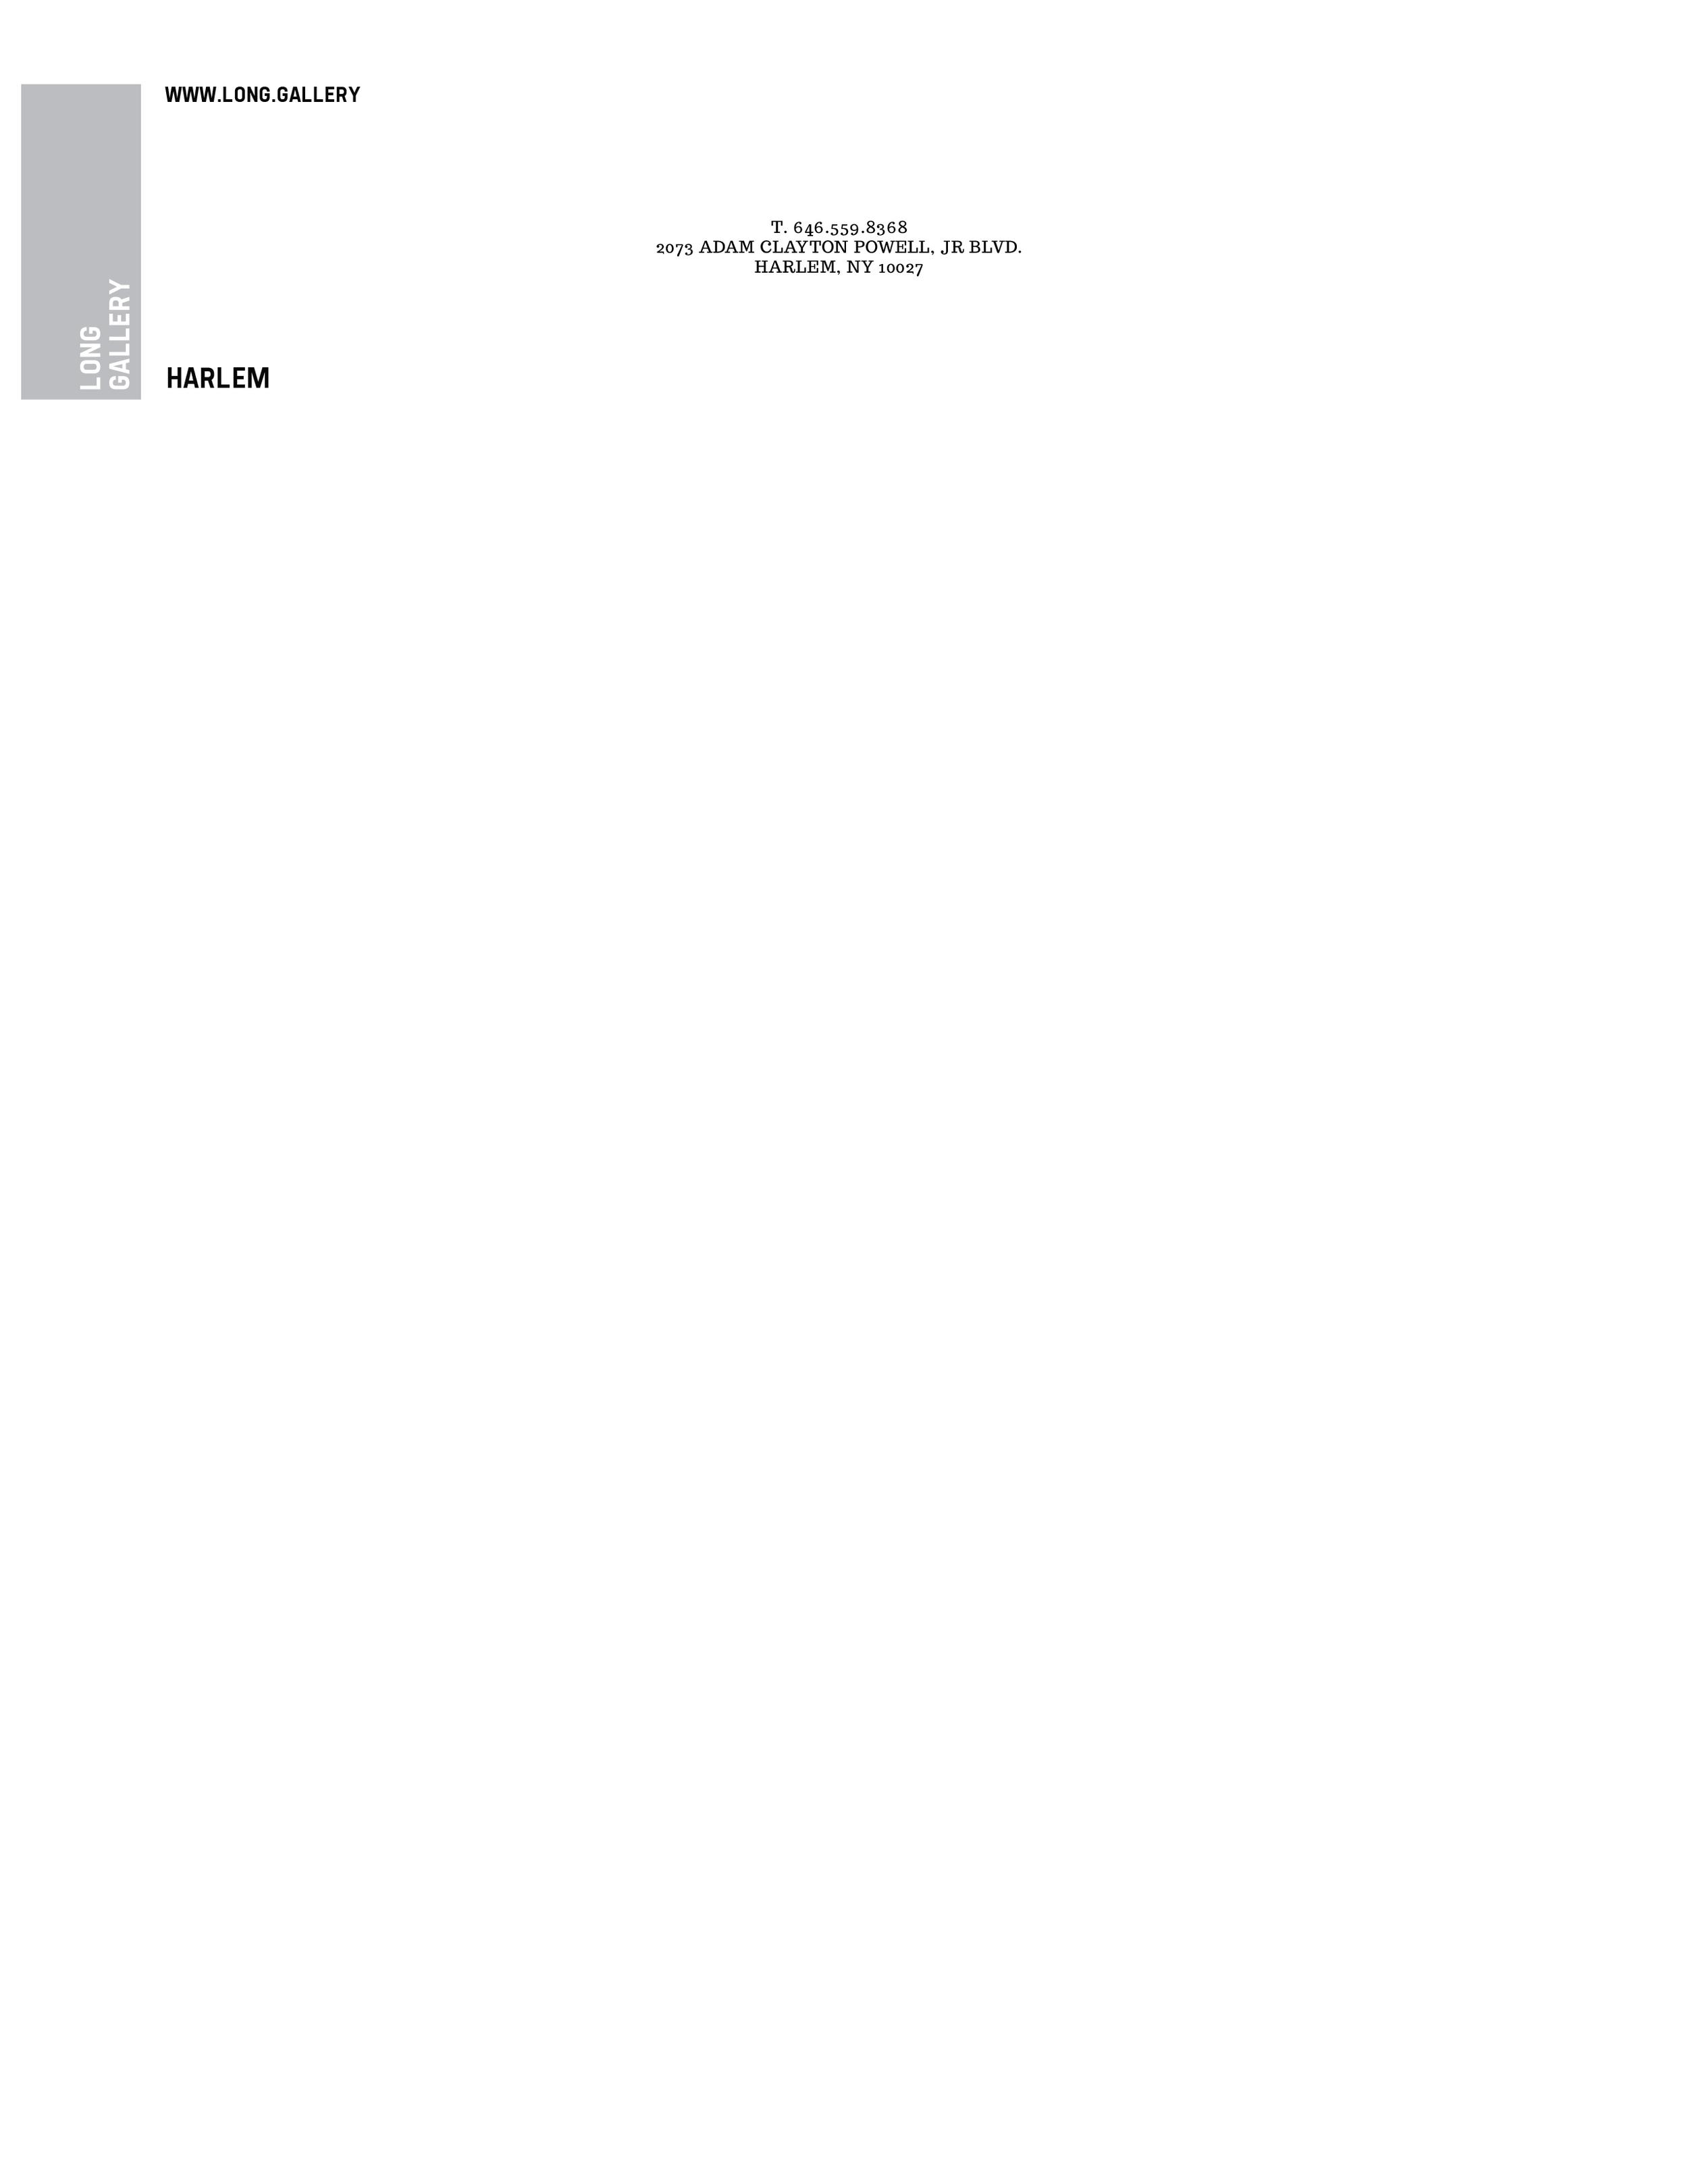 LetterHead -02.jpg